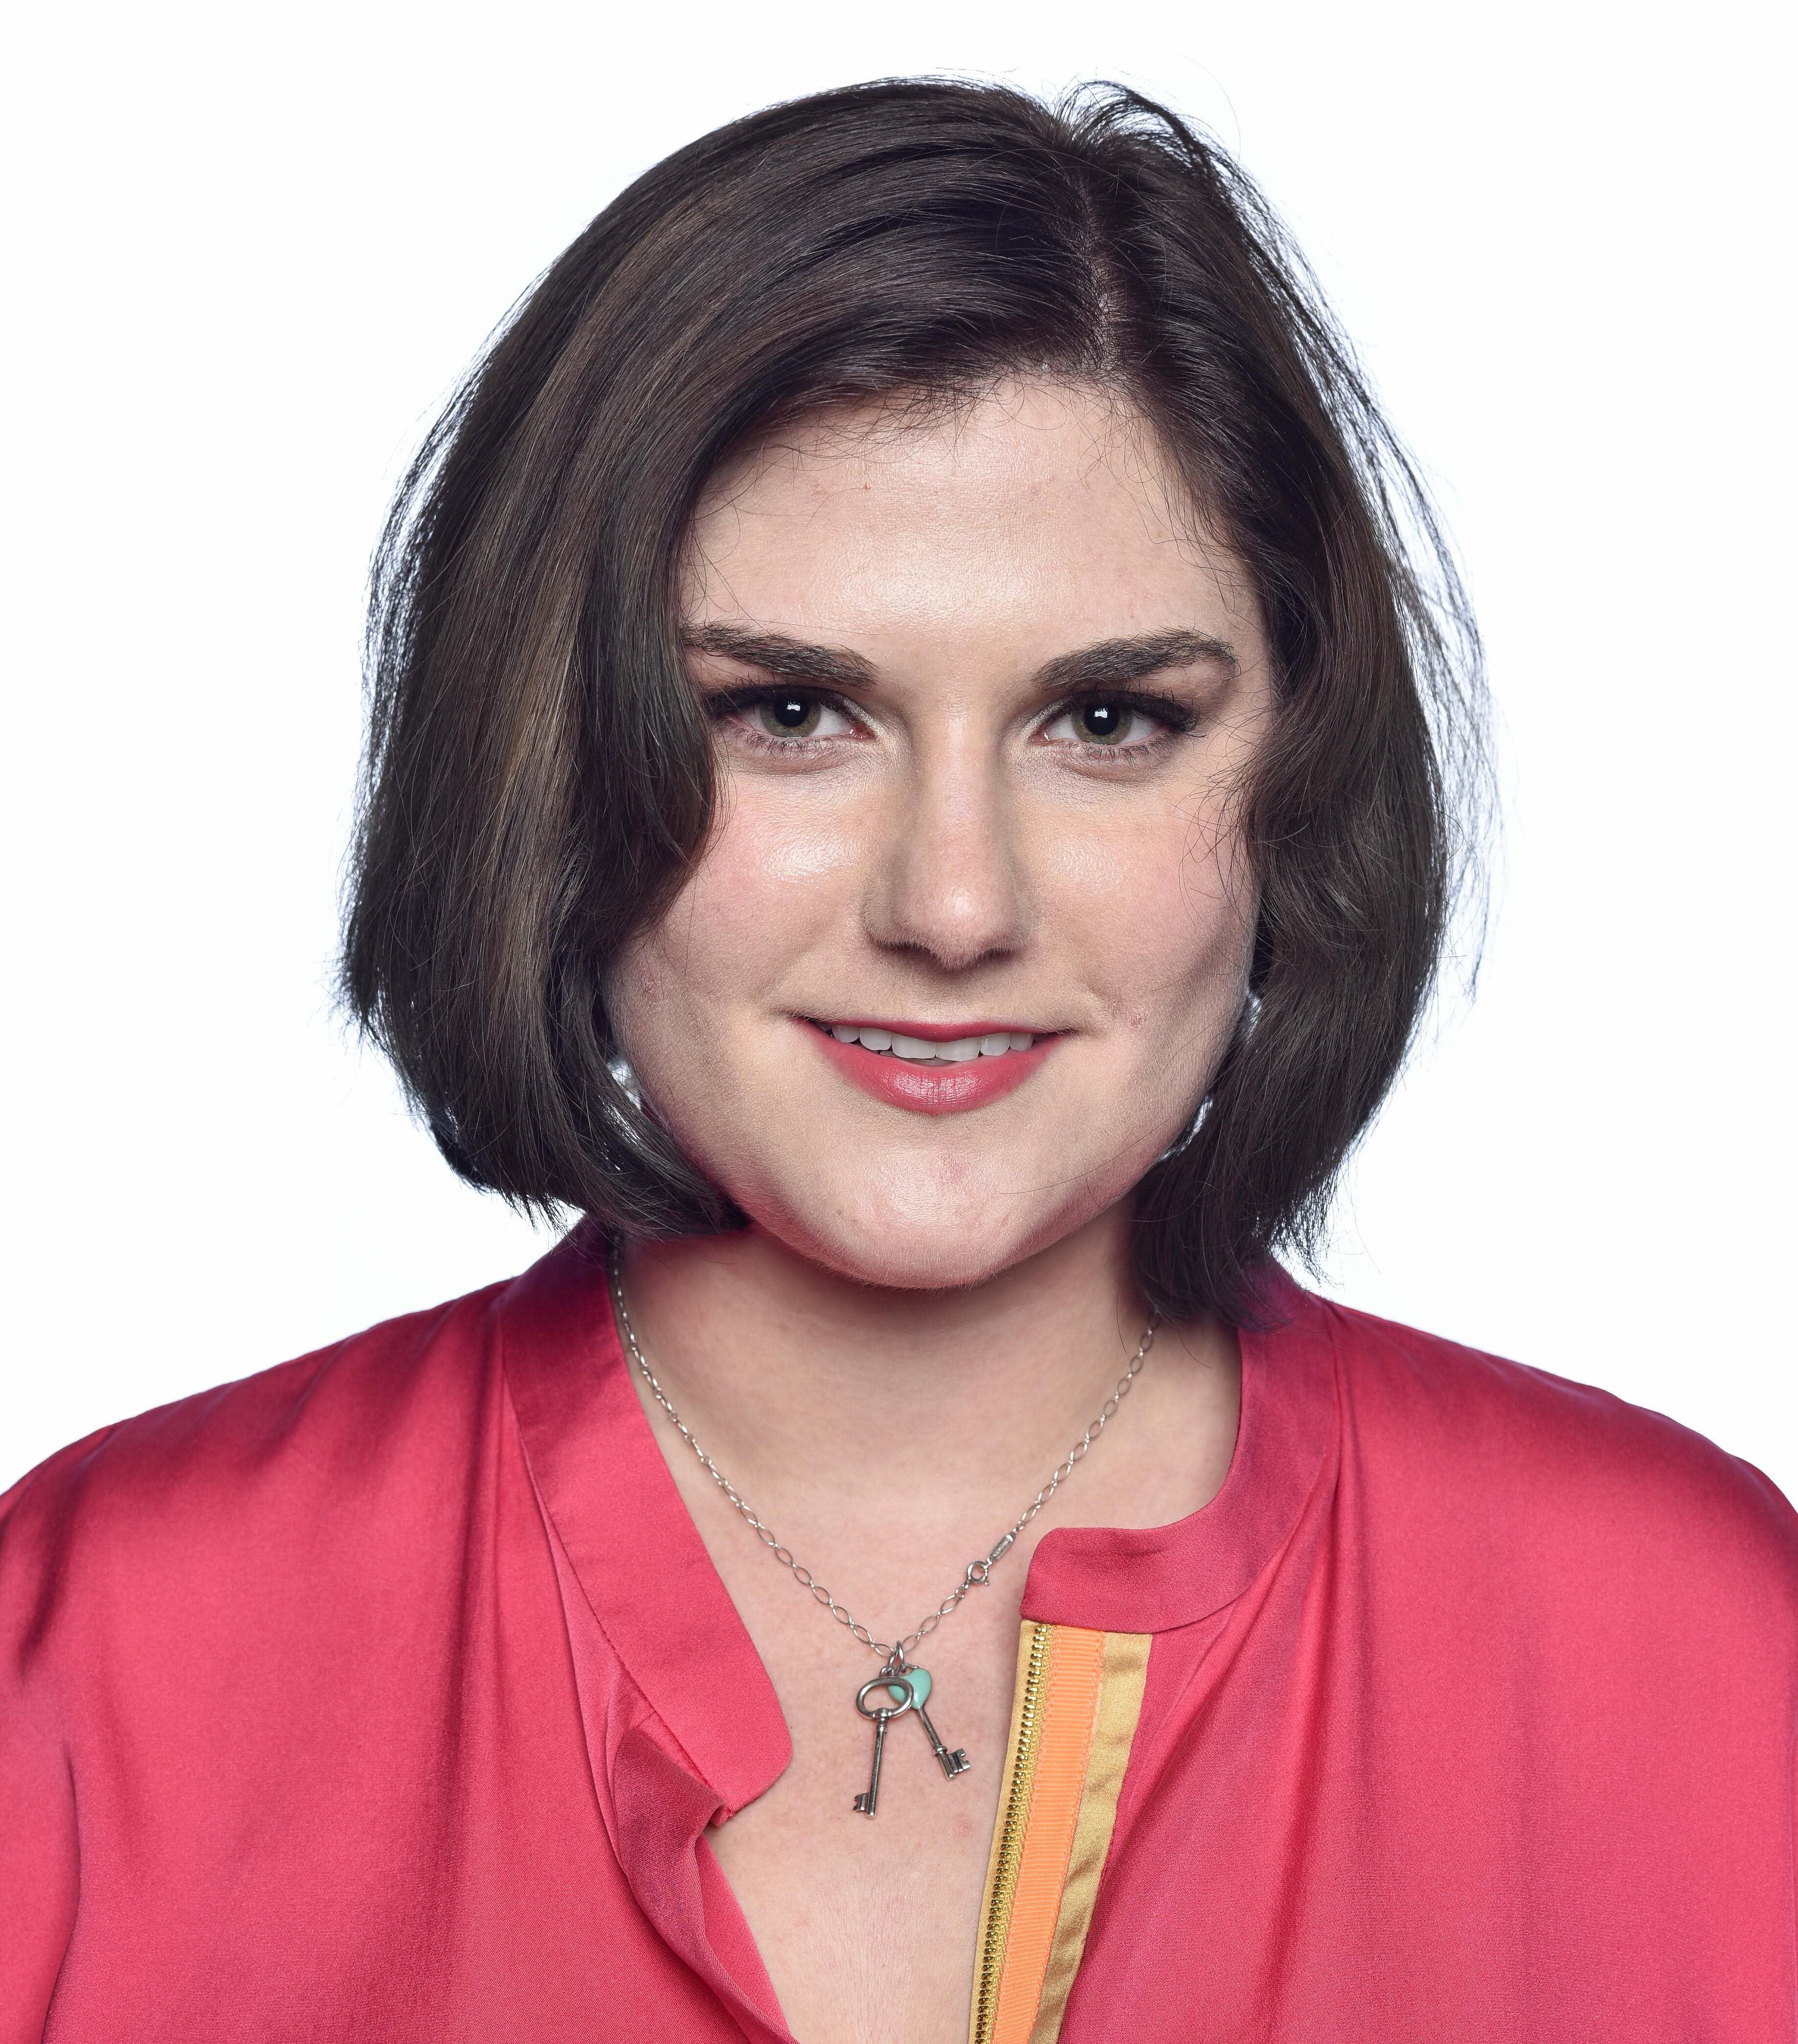 CS alumna Aubrey Sirtautas